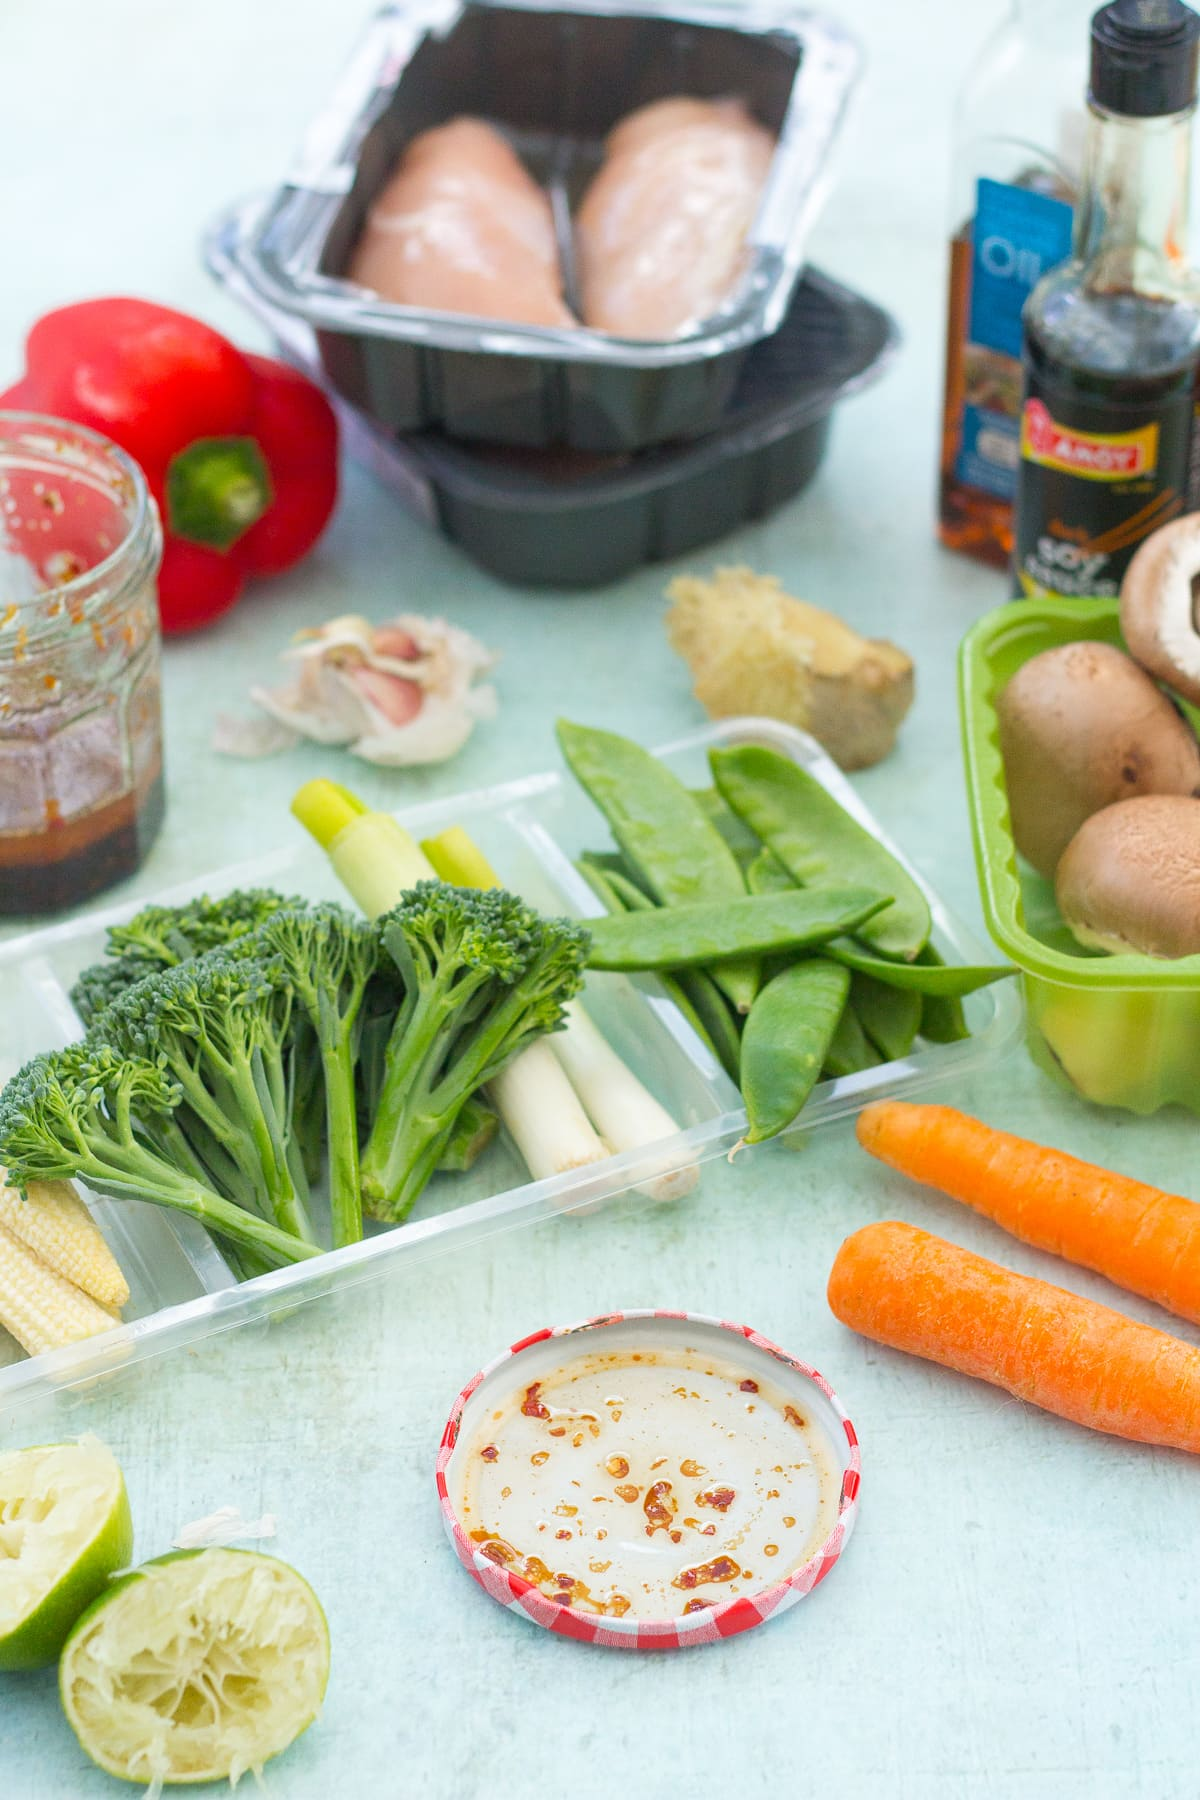 Easy Homemade Chicken Stir Fry Ingredients